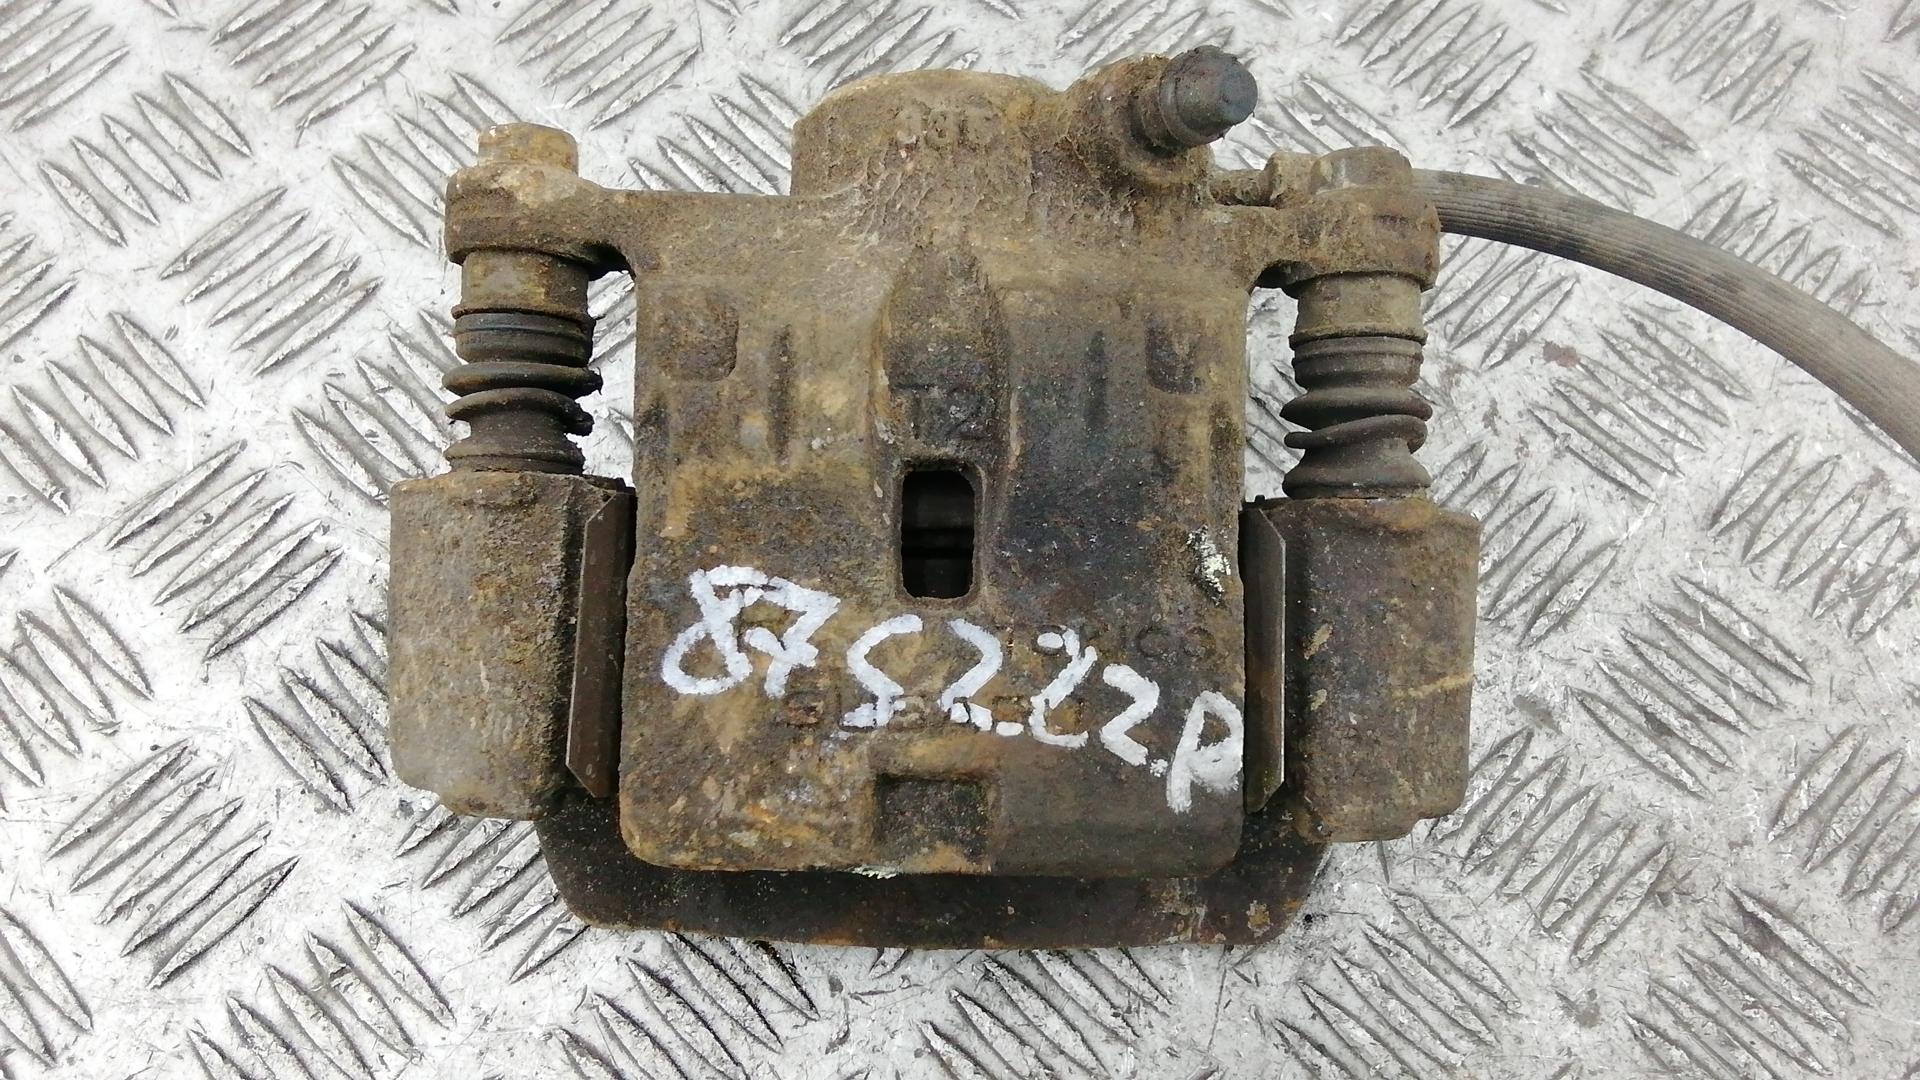 Суппорт тормозной задний правый, SUBARU, FORESTER 3, 2009